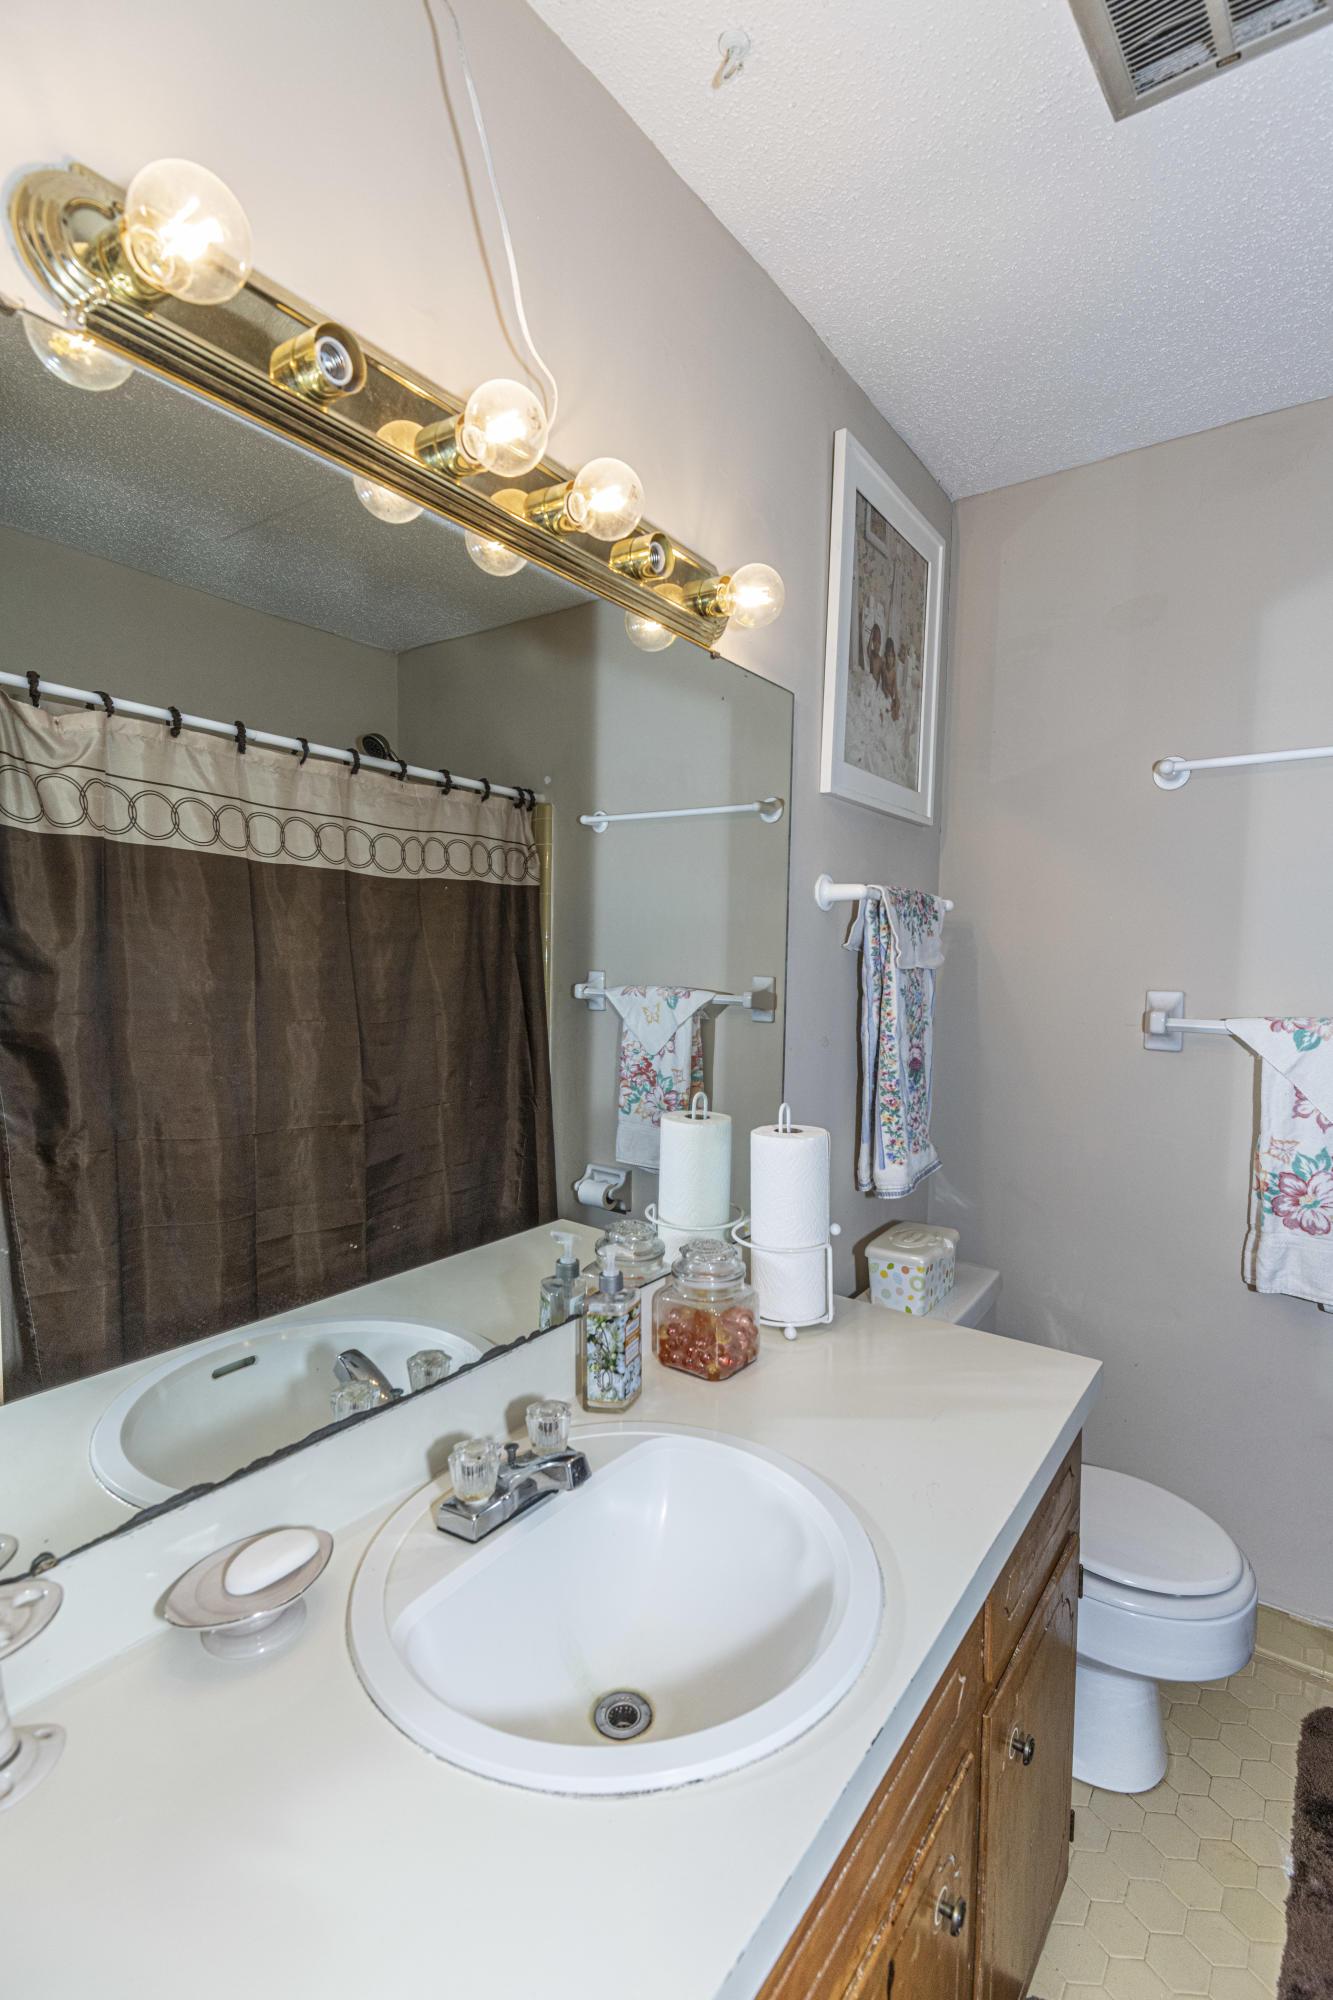 Foxborough Homes For Sale - 131 Kennington, Goose Creek, SC - 8